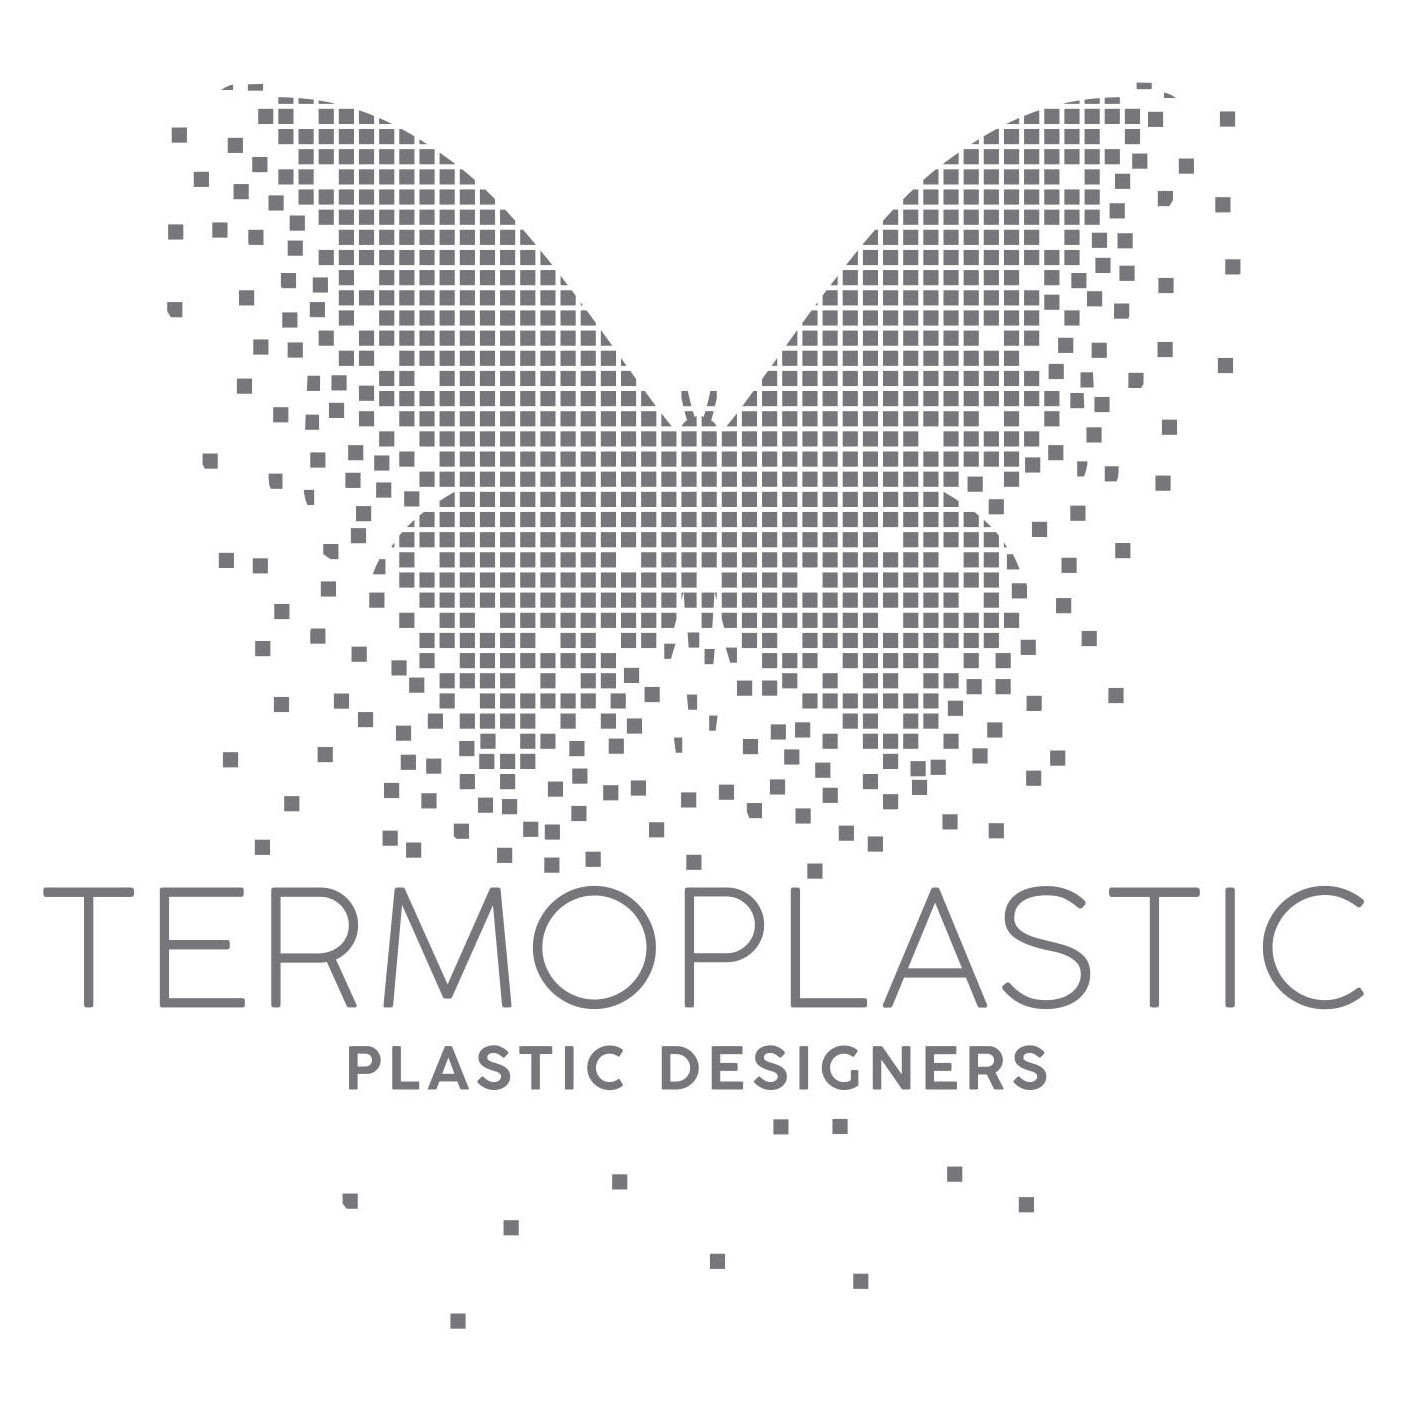 Termoplastic